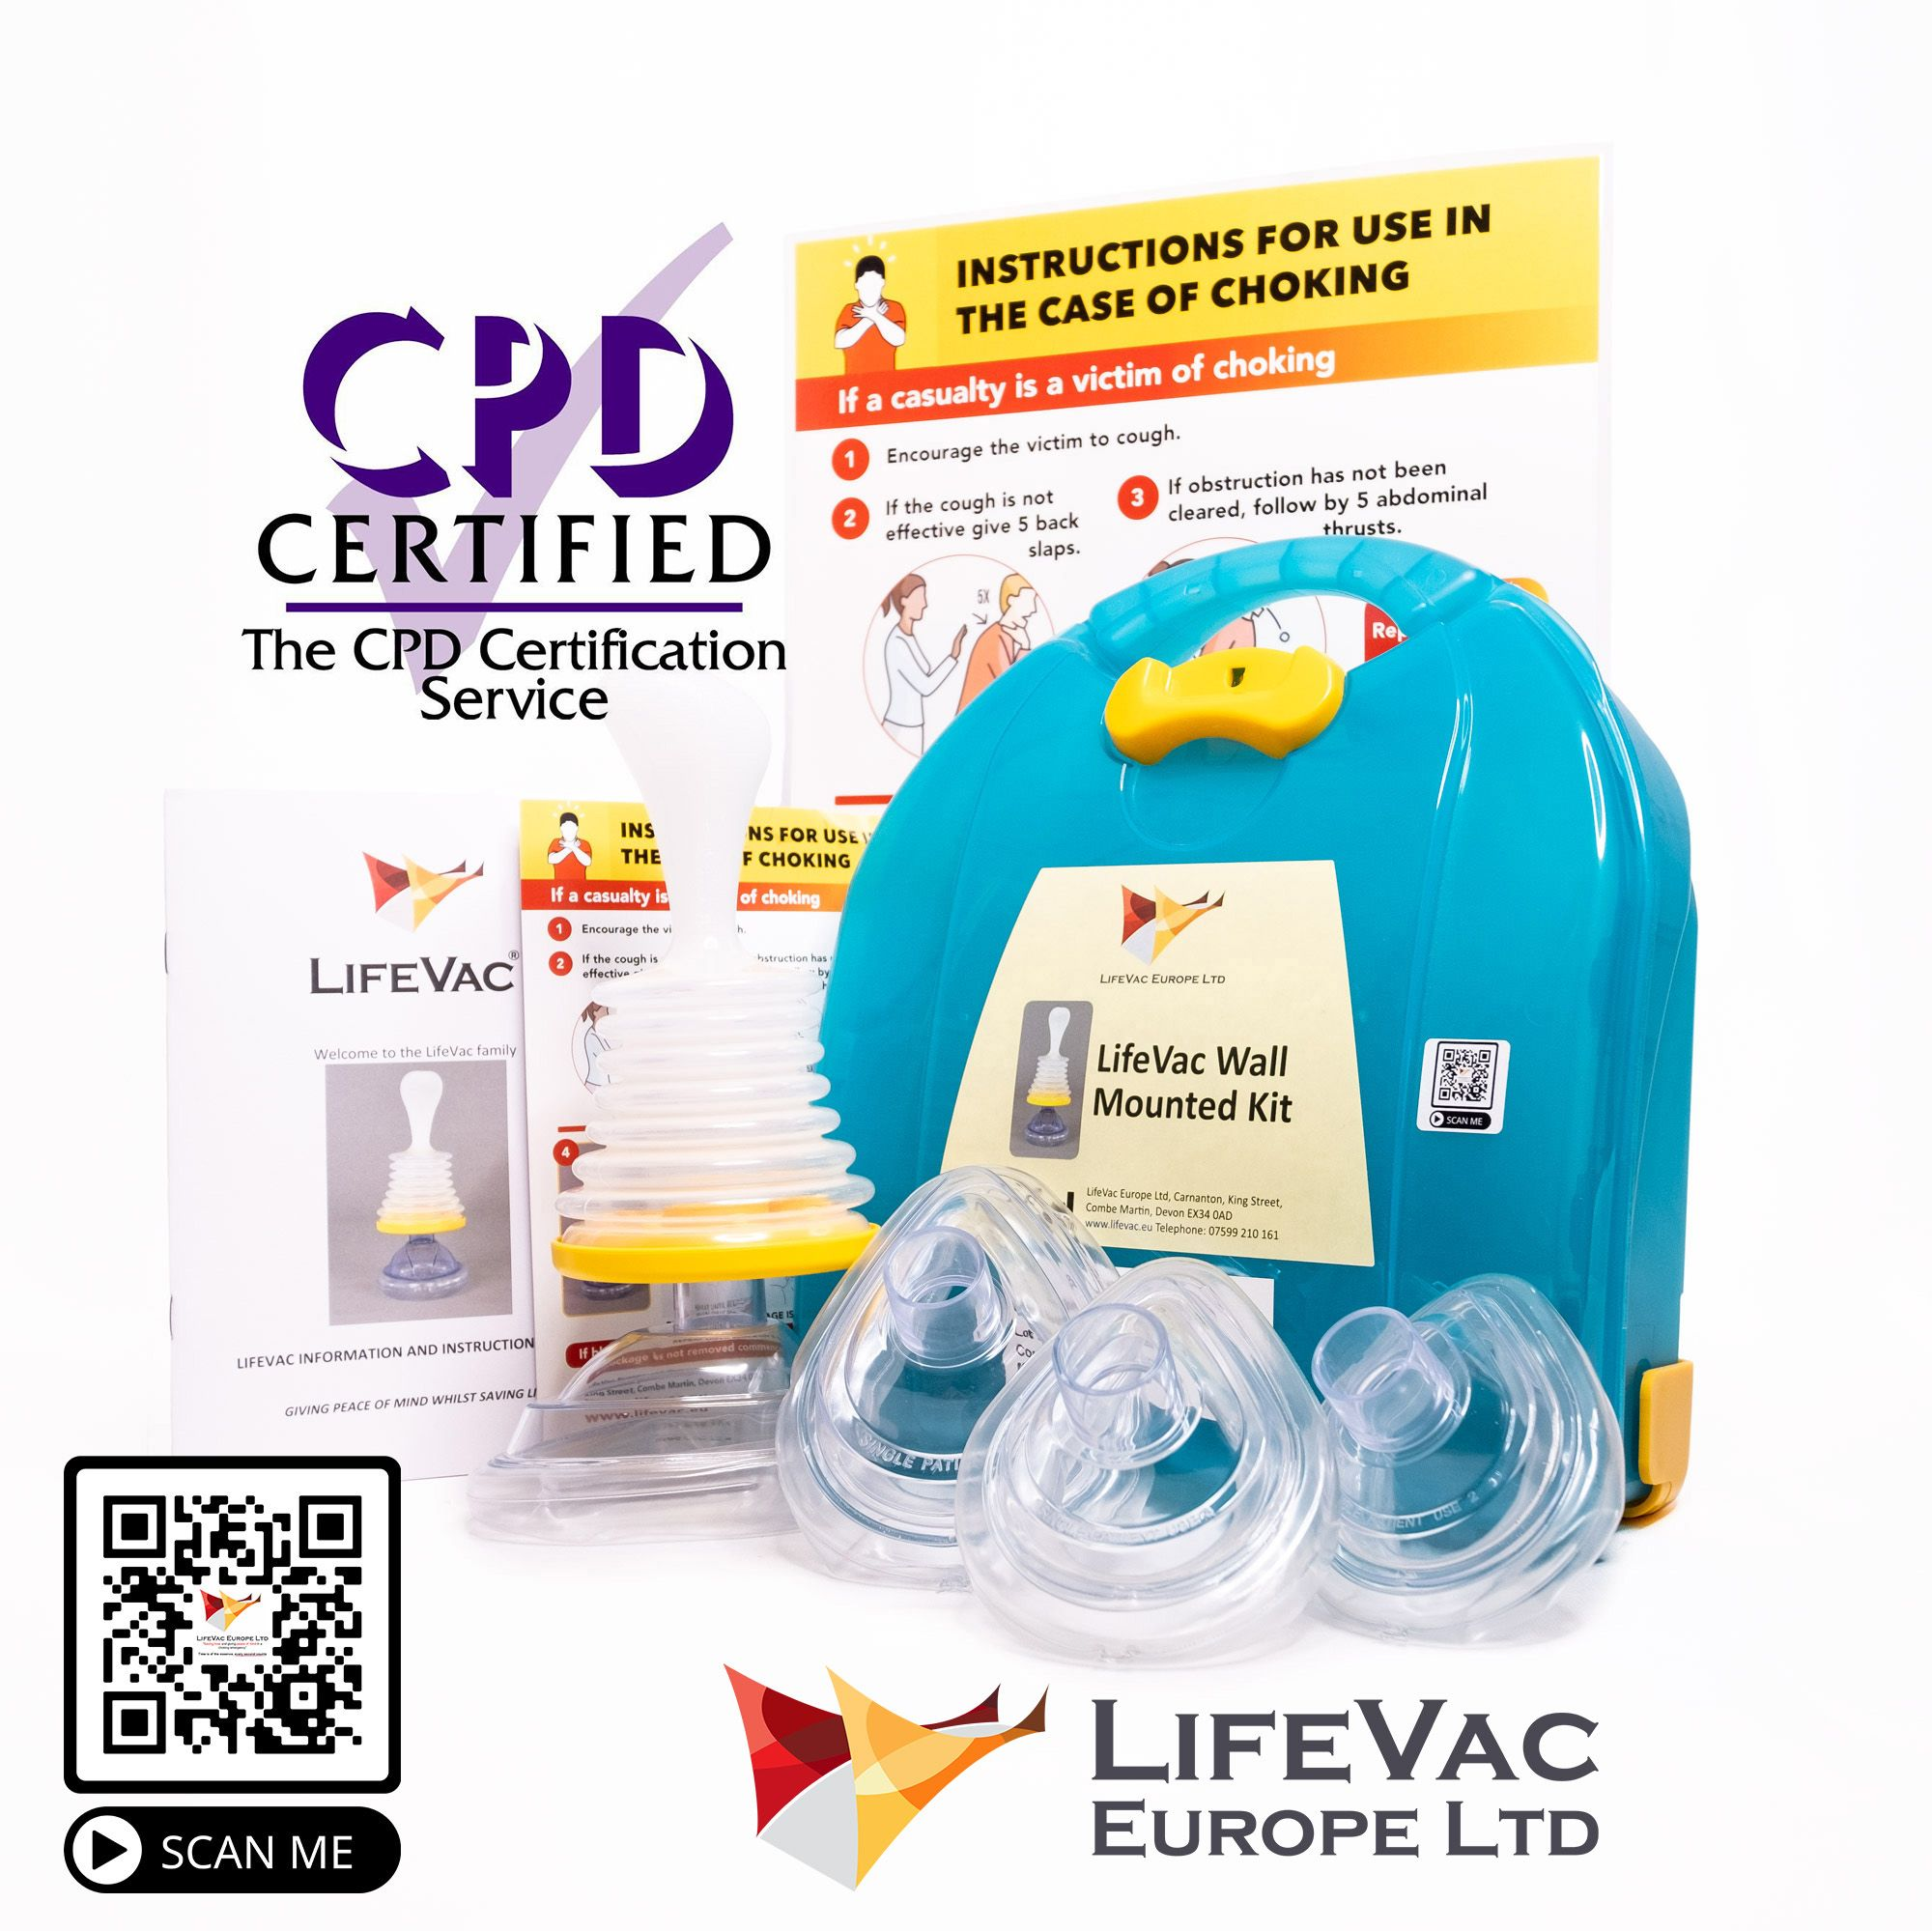 LifeVac Europe Limited